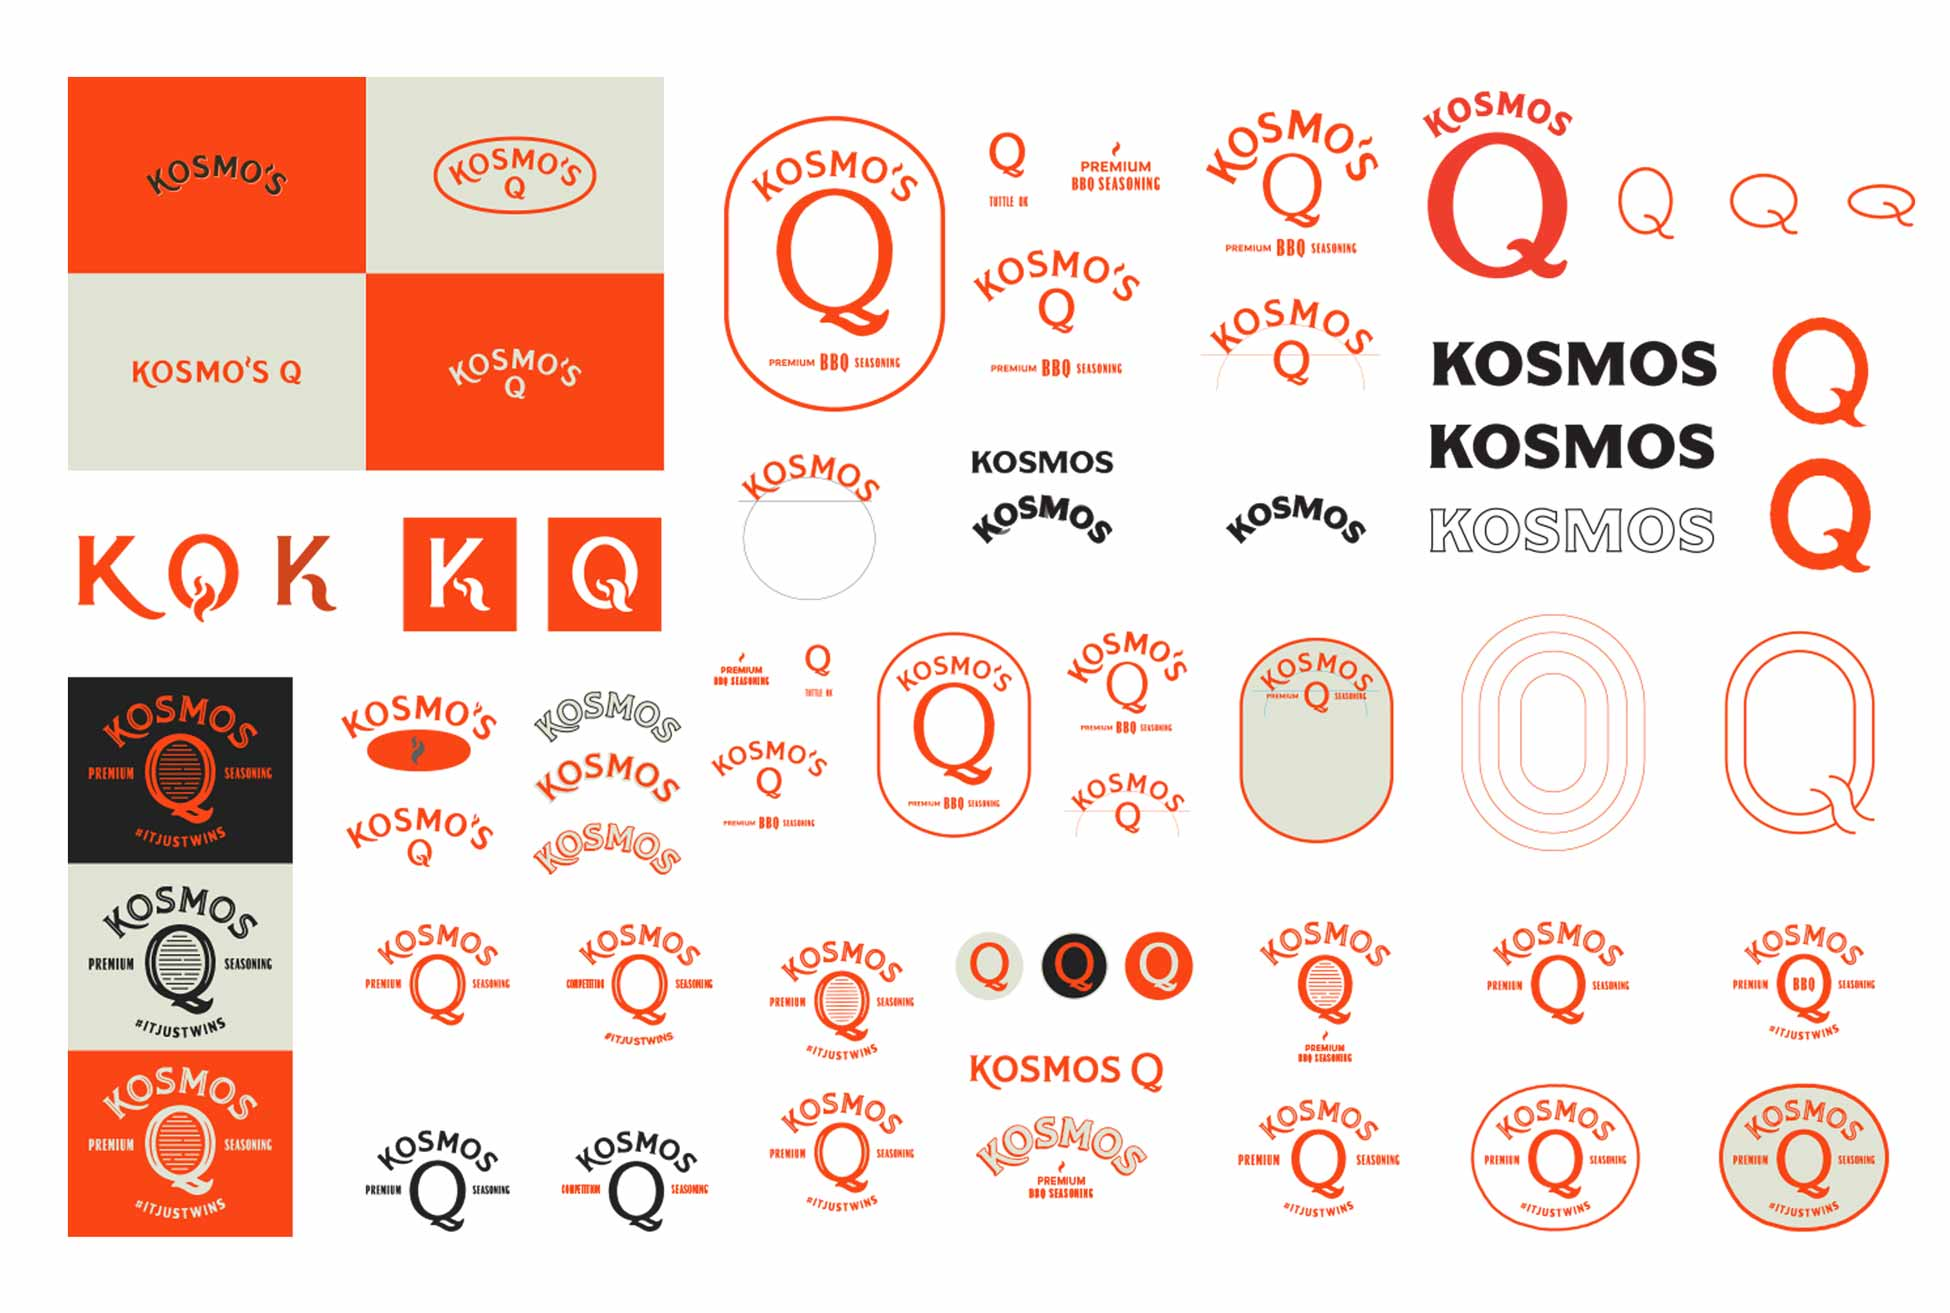 kosmosq_explorations.jpg